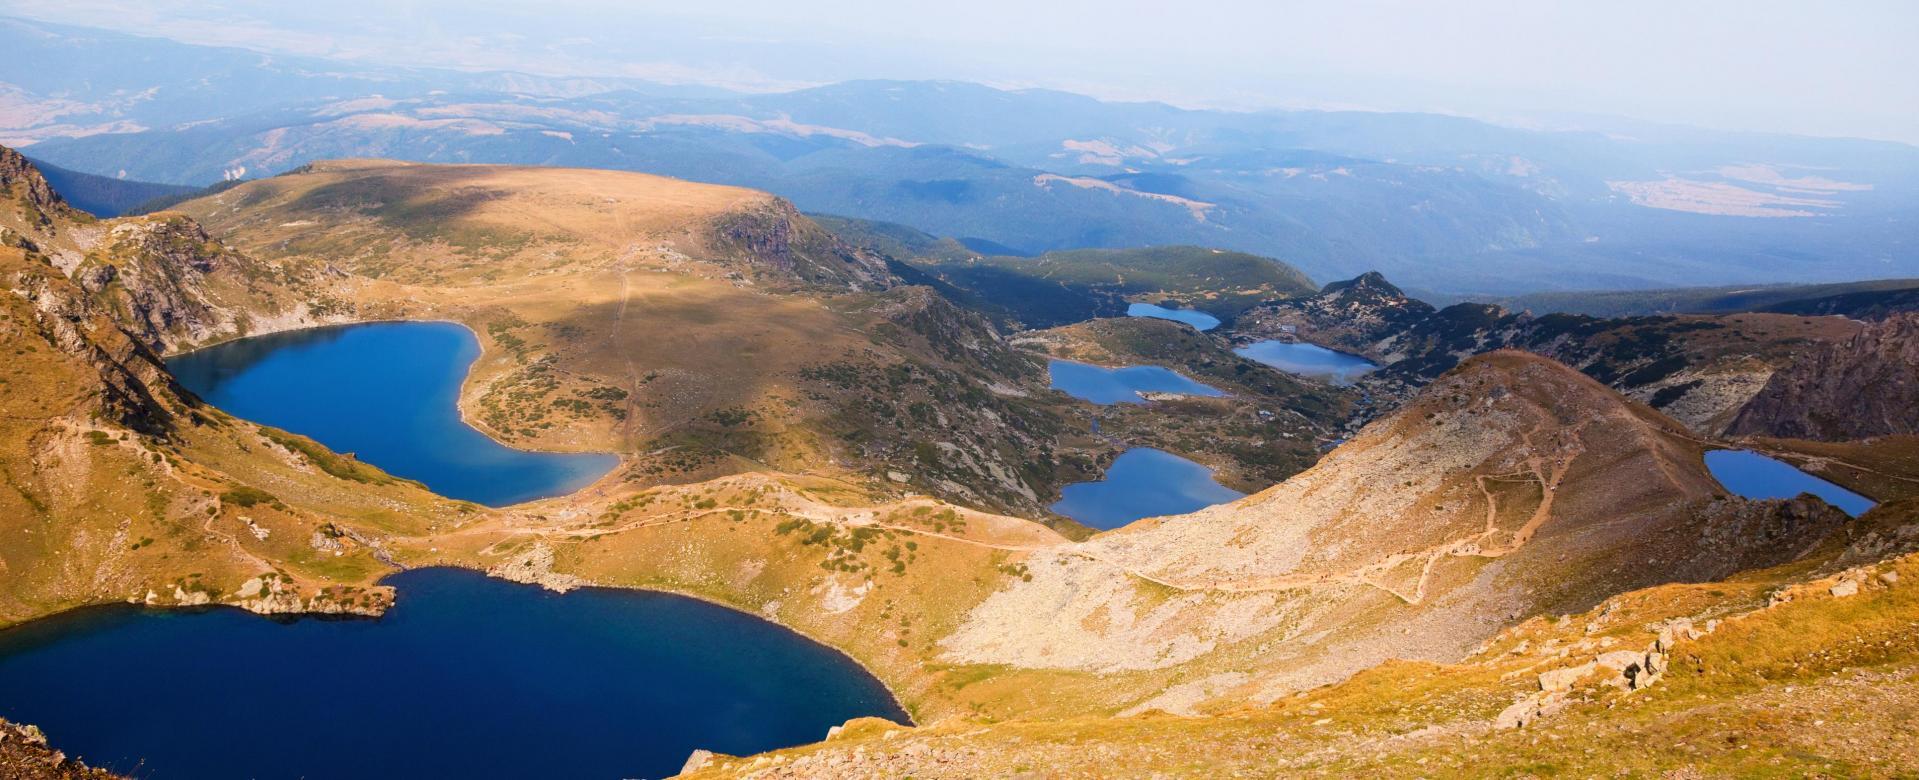 Voyage à pied : Trilogie bulgare : balkan, rila et pirin